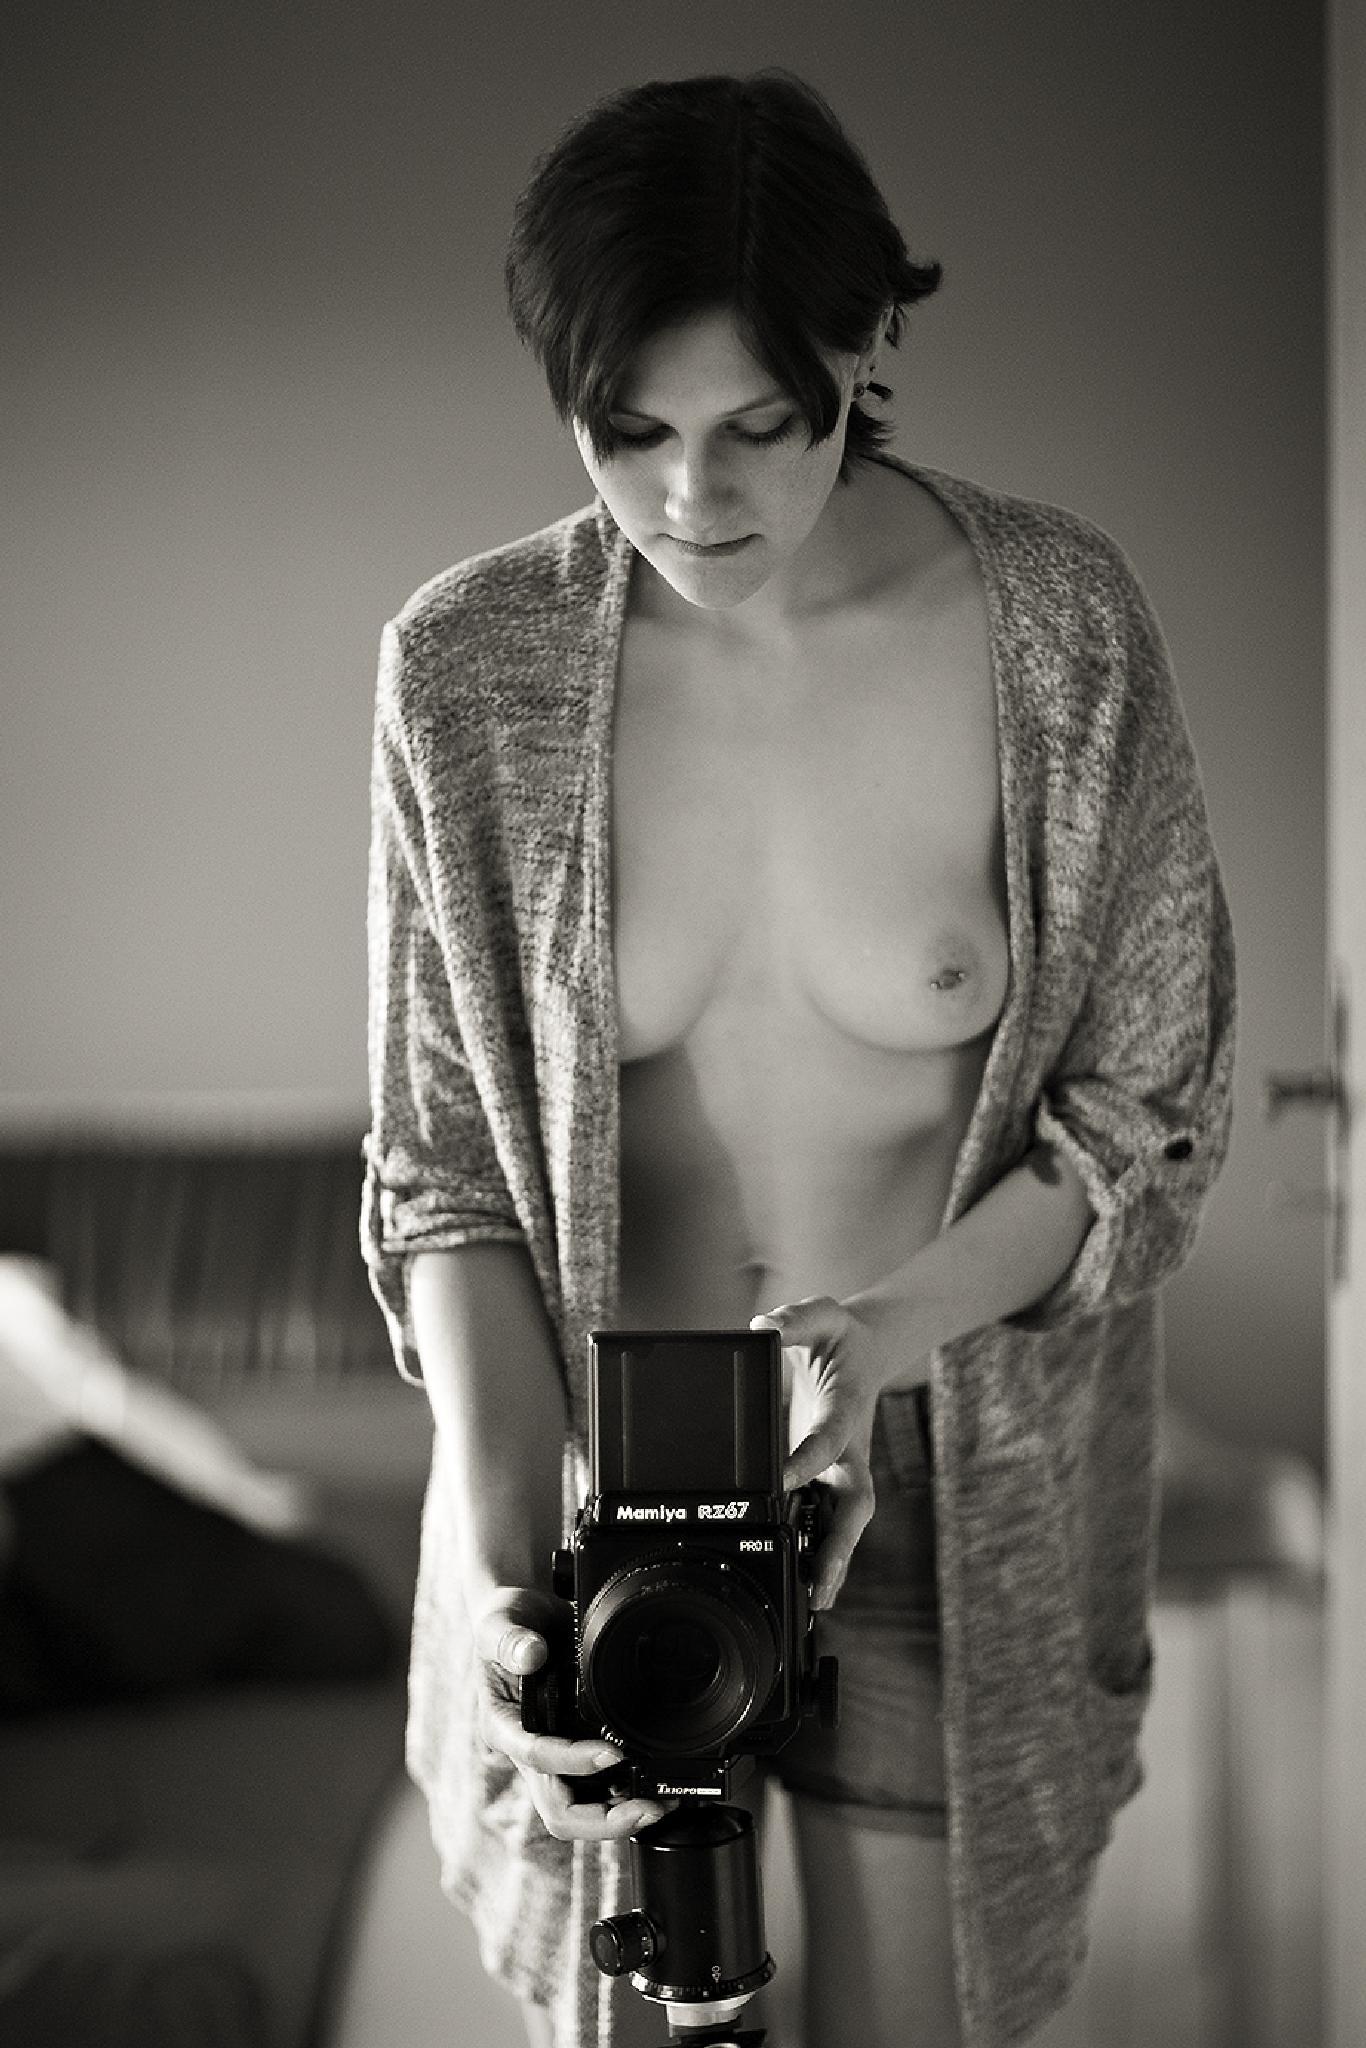 Sexy photographer by BerndKinghorst